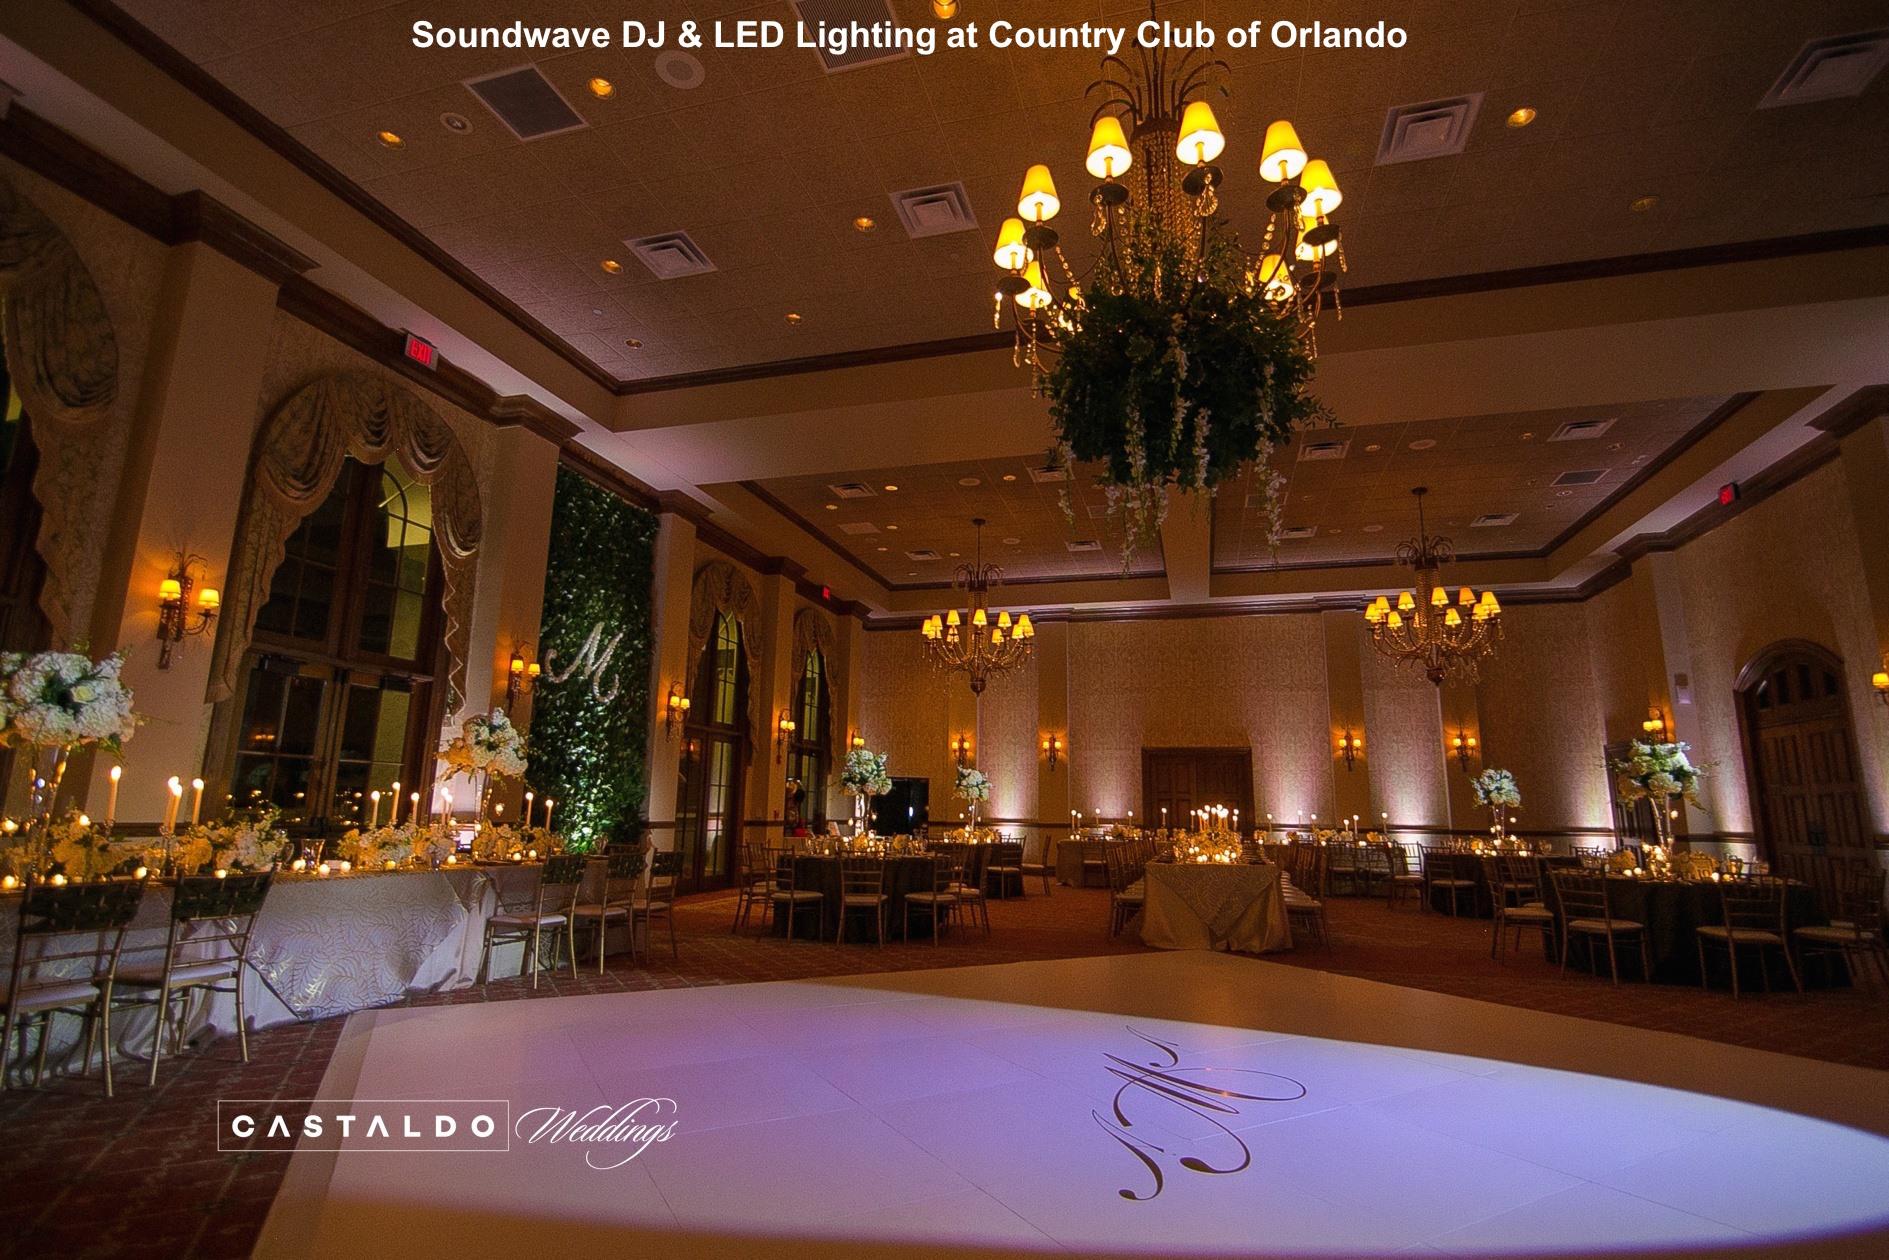 country club of orlando - orlando wedding venue - orlando wedding djs - orlando led lighting - soundwave entertainment